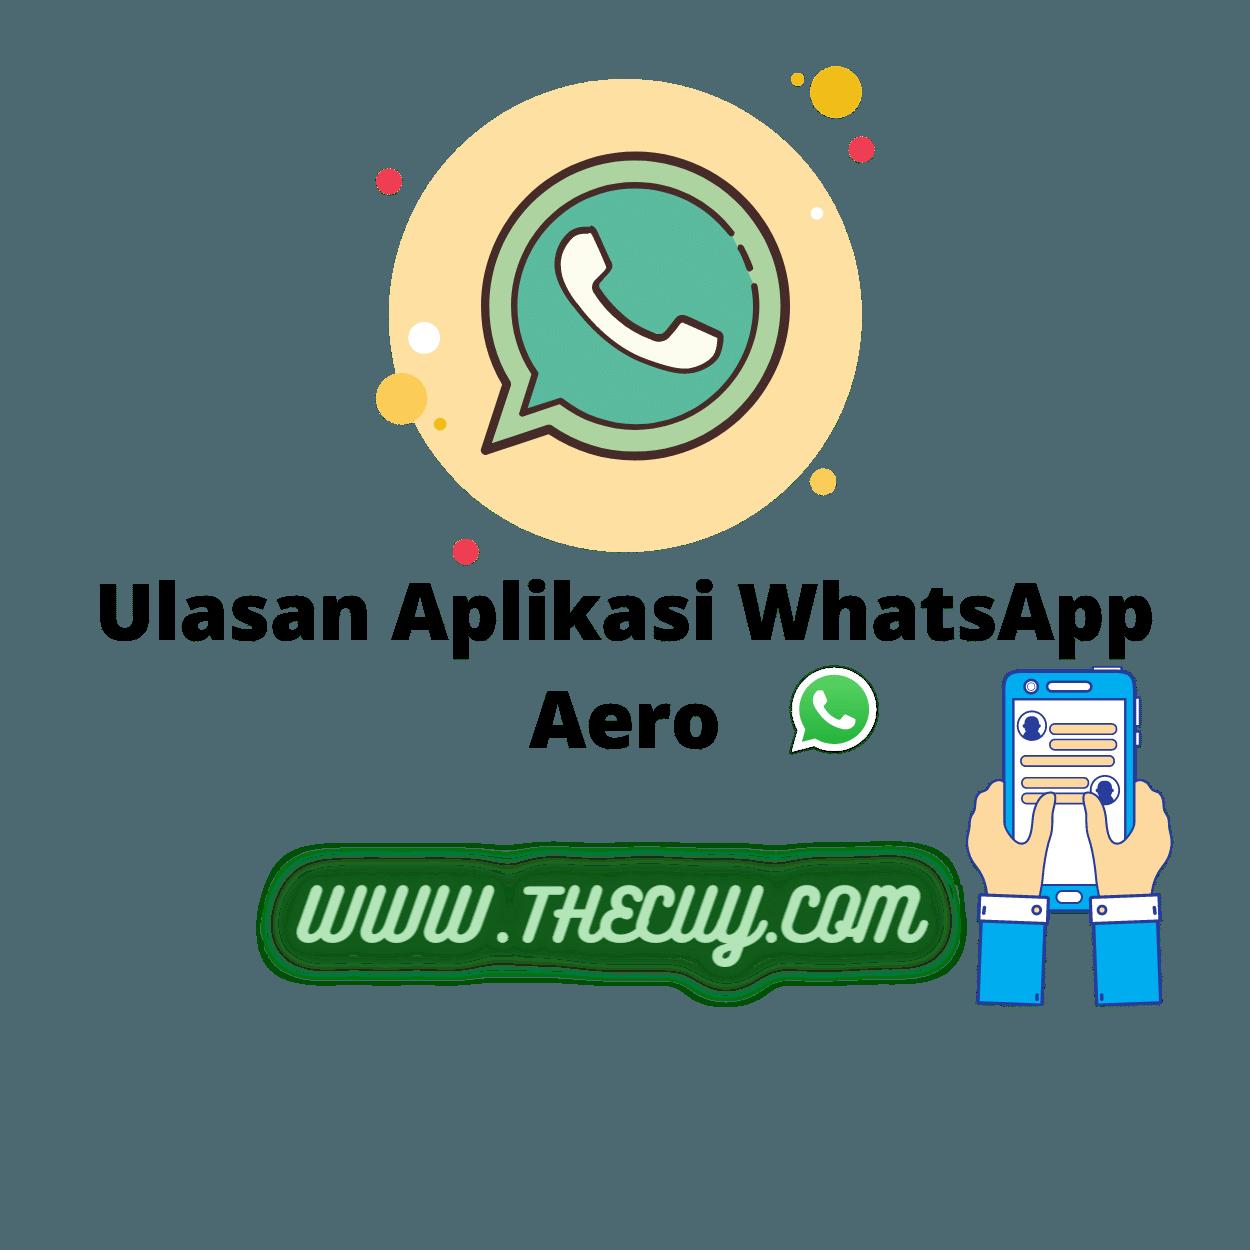 Ulasan Aplikasi WhatsApp Aero